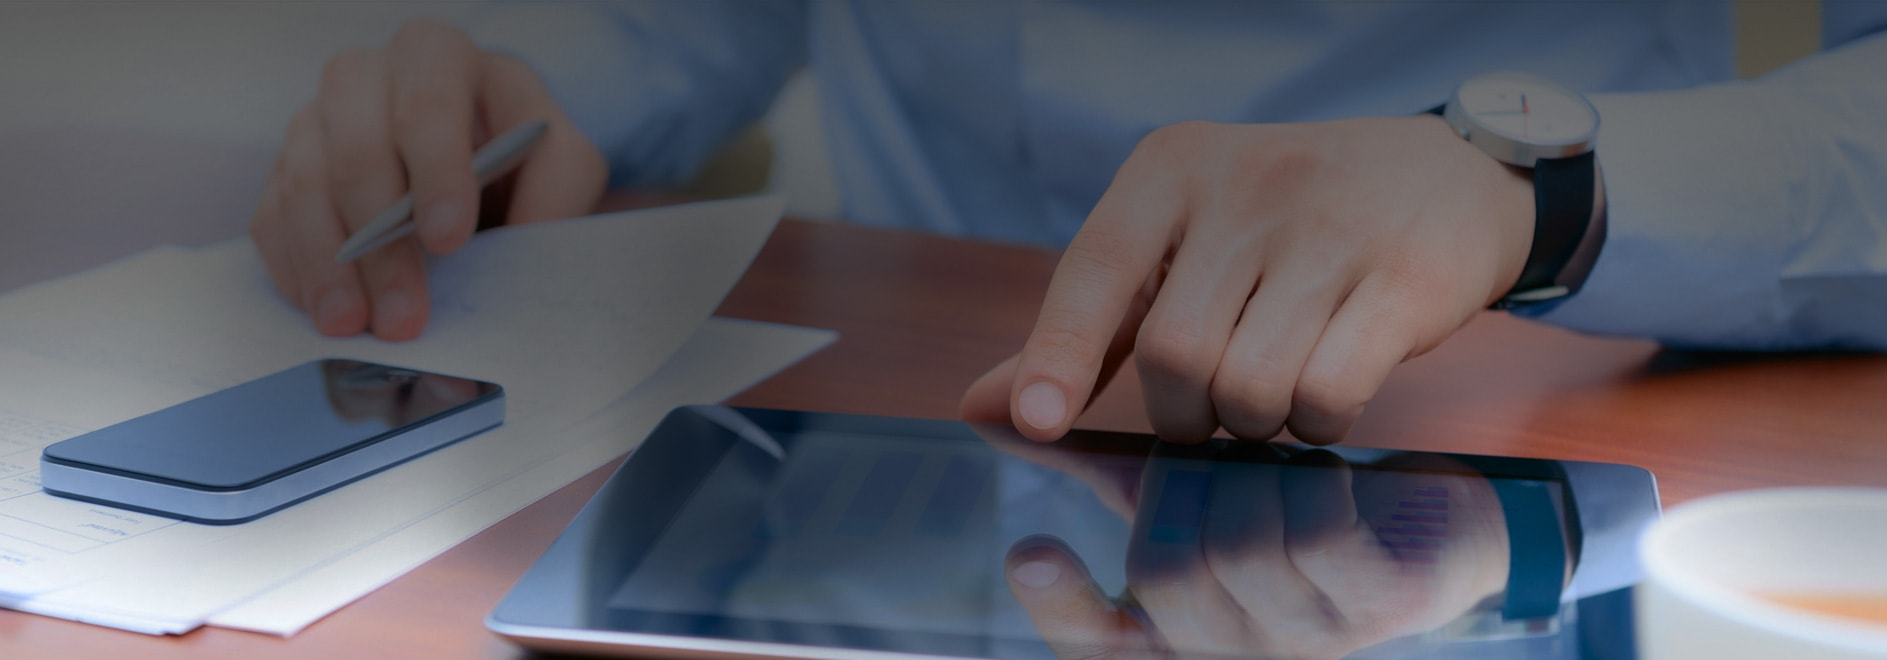 Loan Application Software for Websites